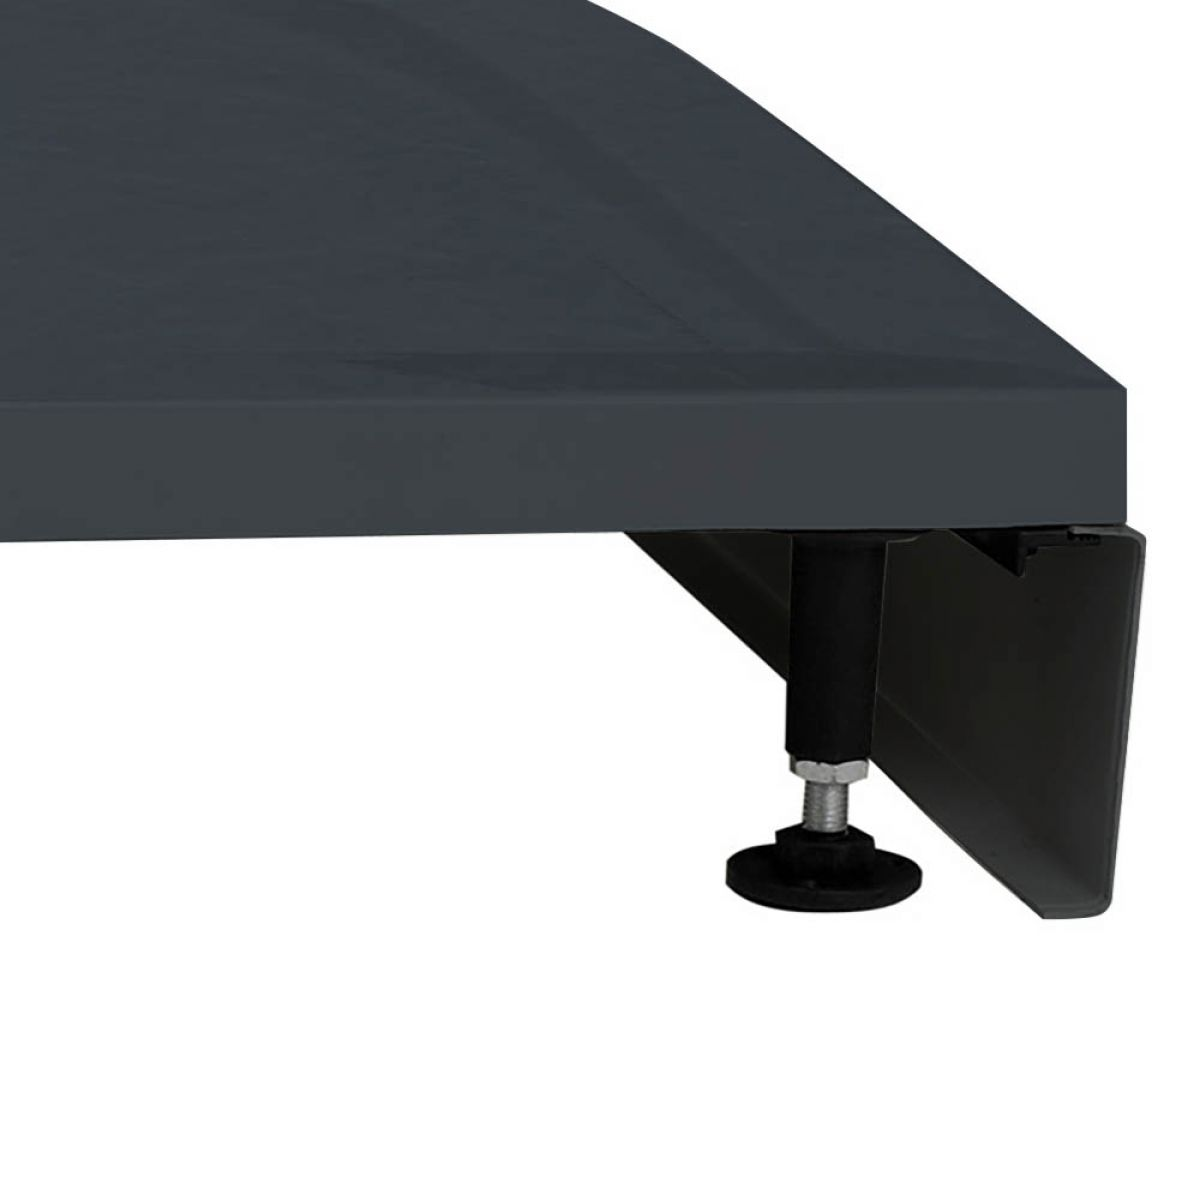 Pearlstone Slate Grey Riser Kit